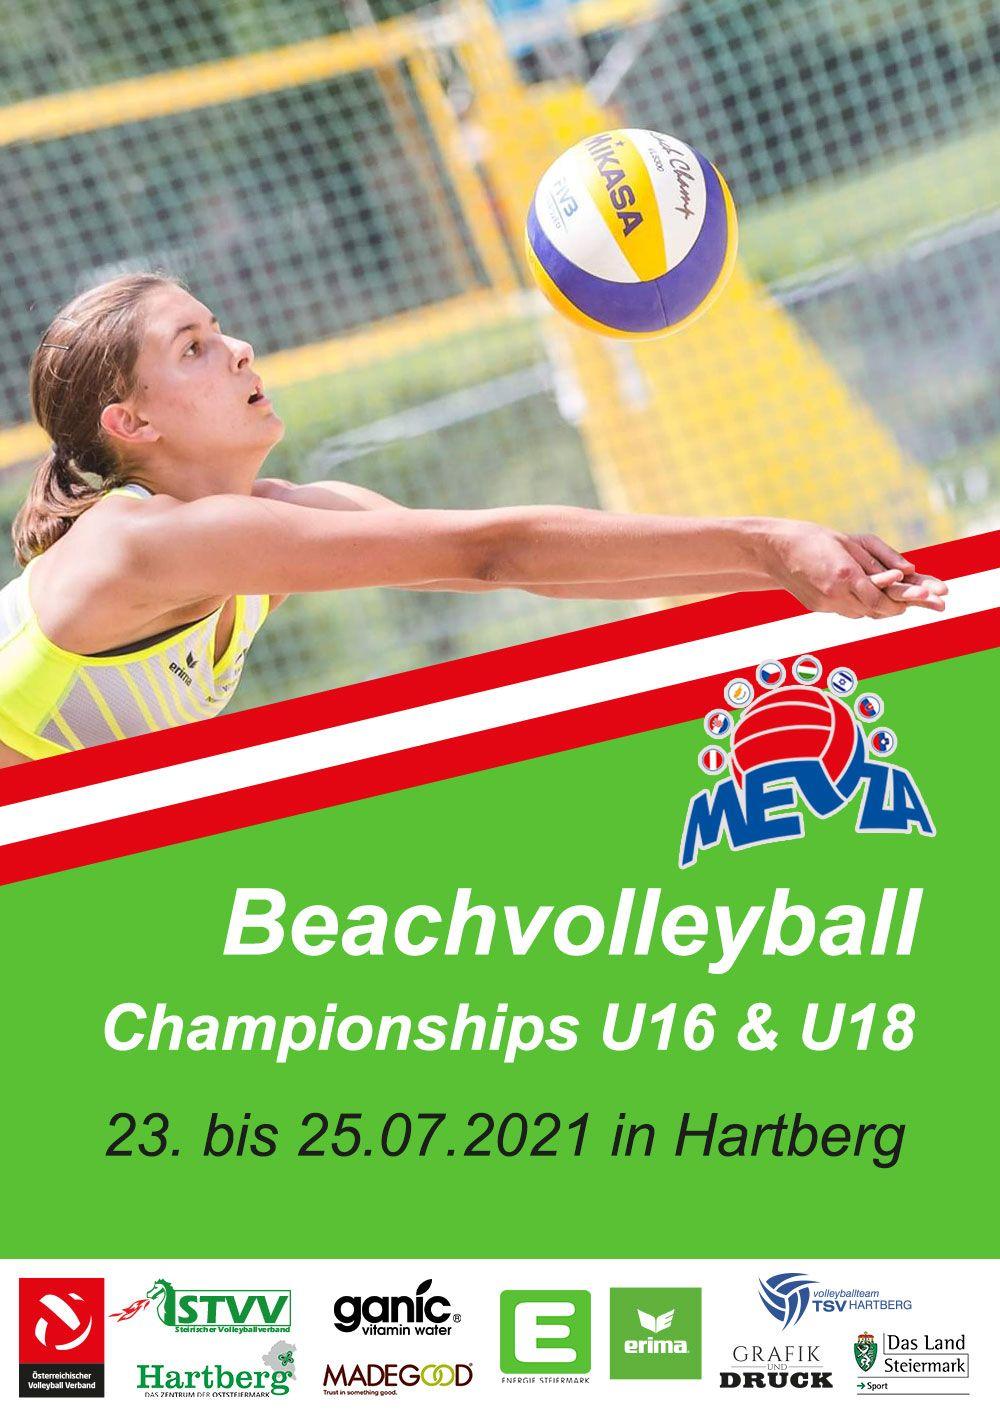 Event MEVZA Beach Volleyball Champions U16 & U18